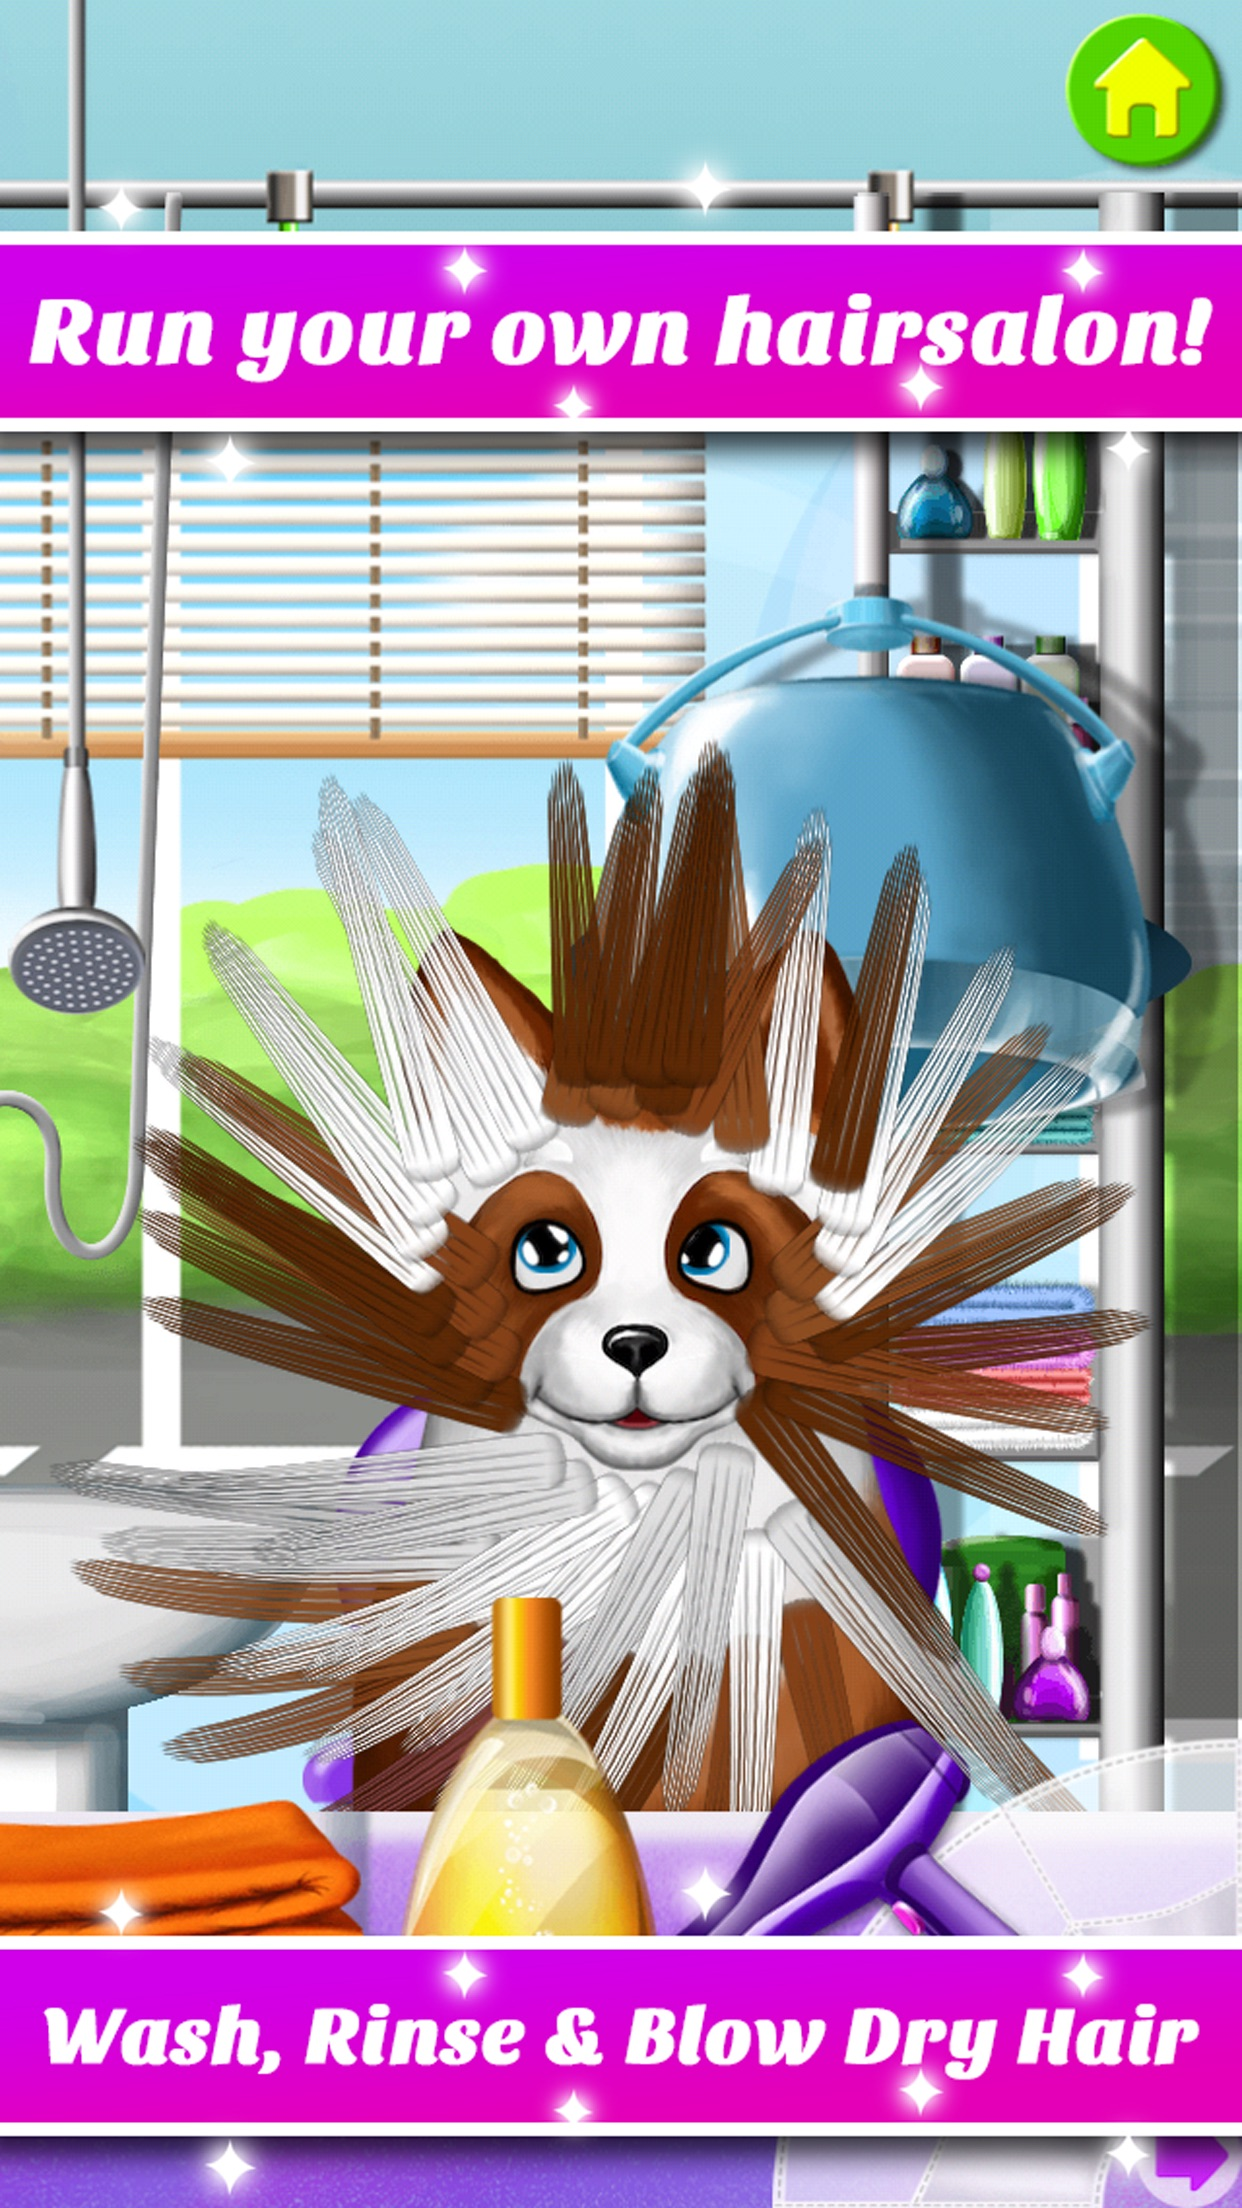 Hair Salon Makeover - Cut, Curl, Color, Style Hair Screenshot